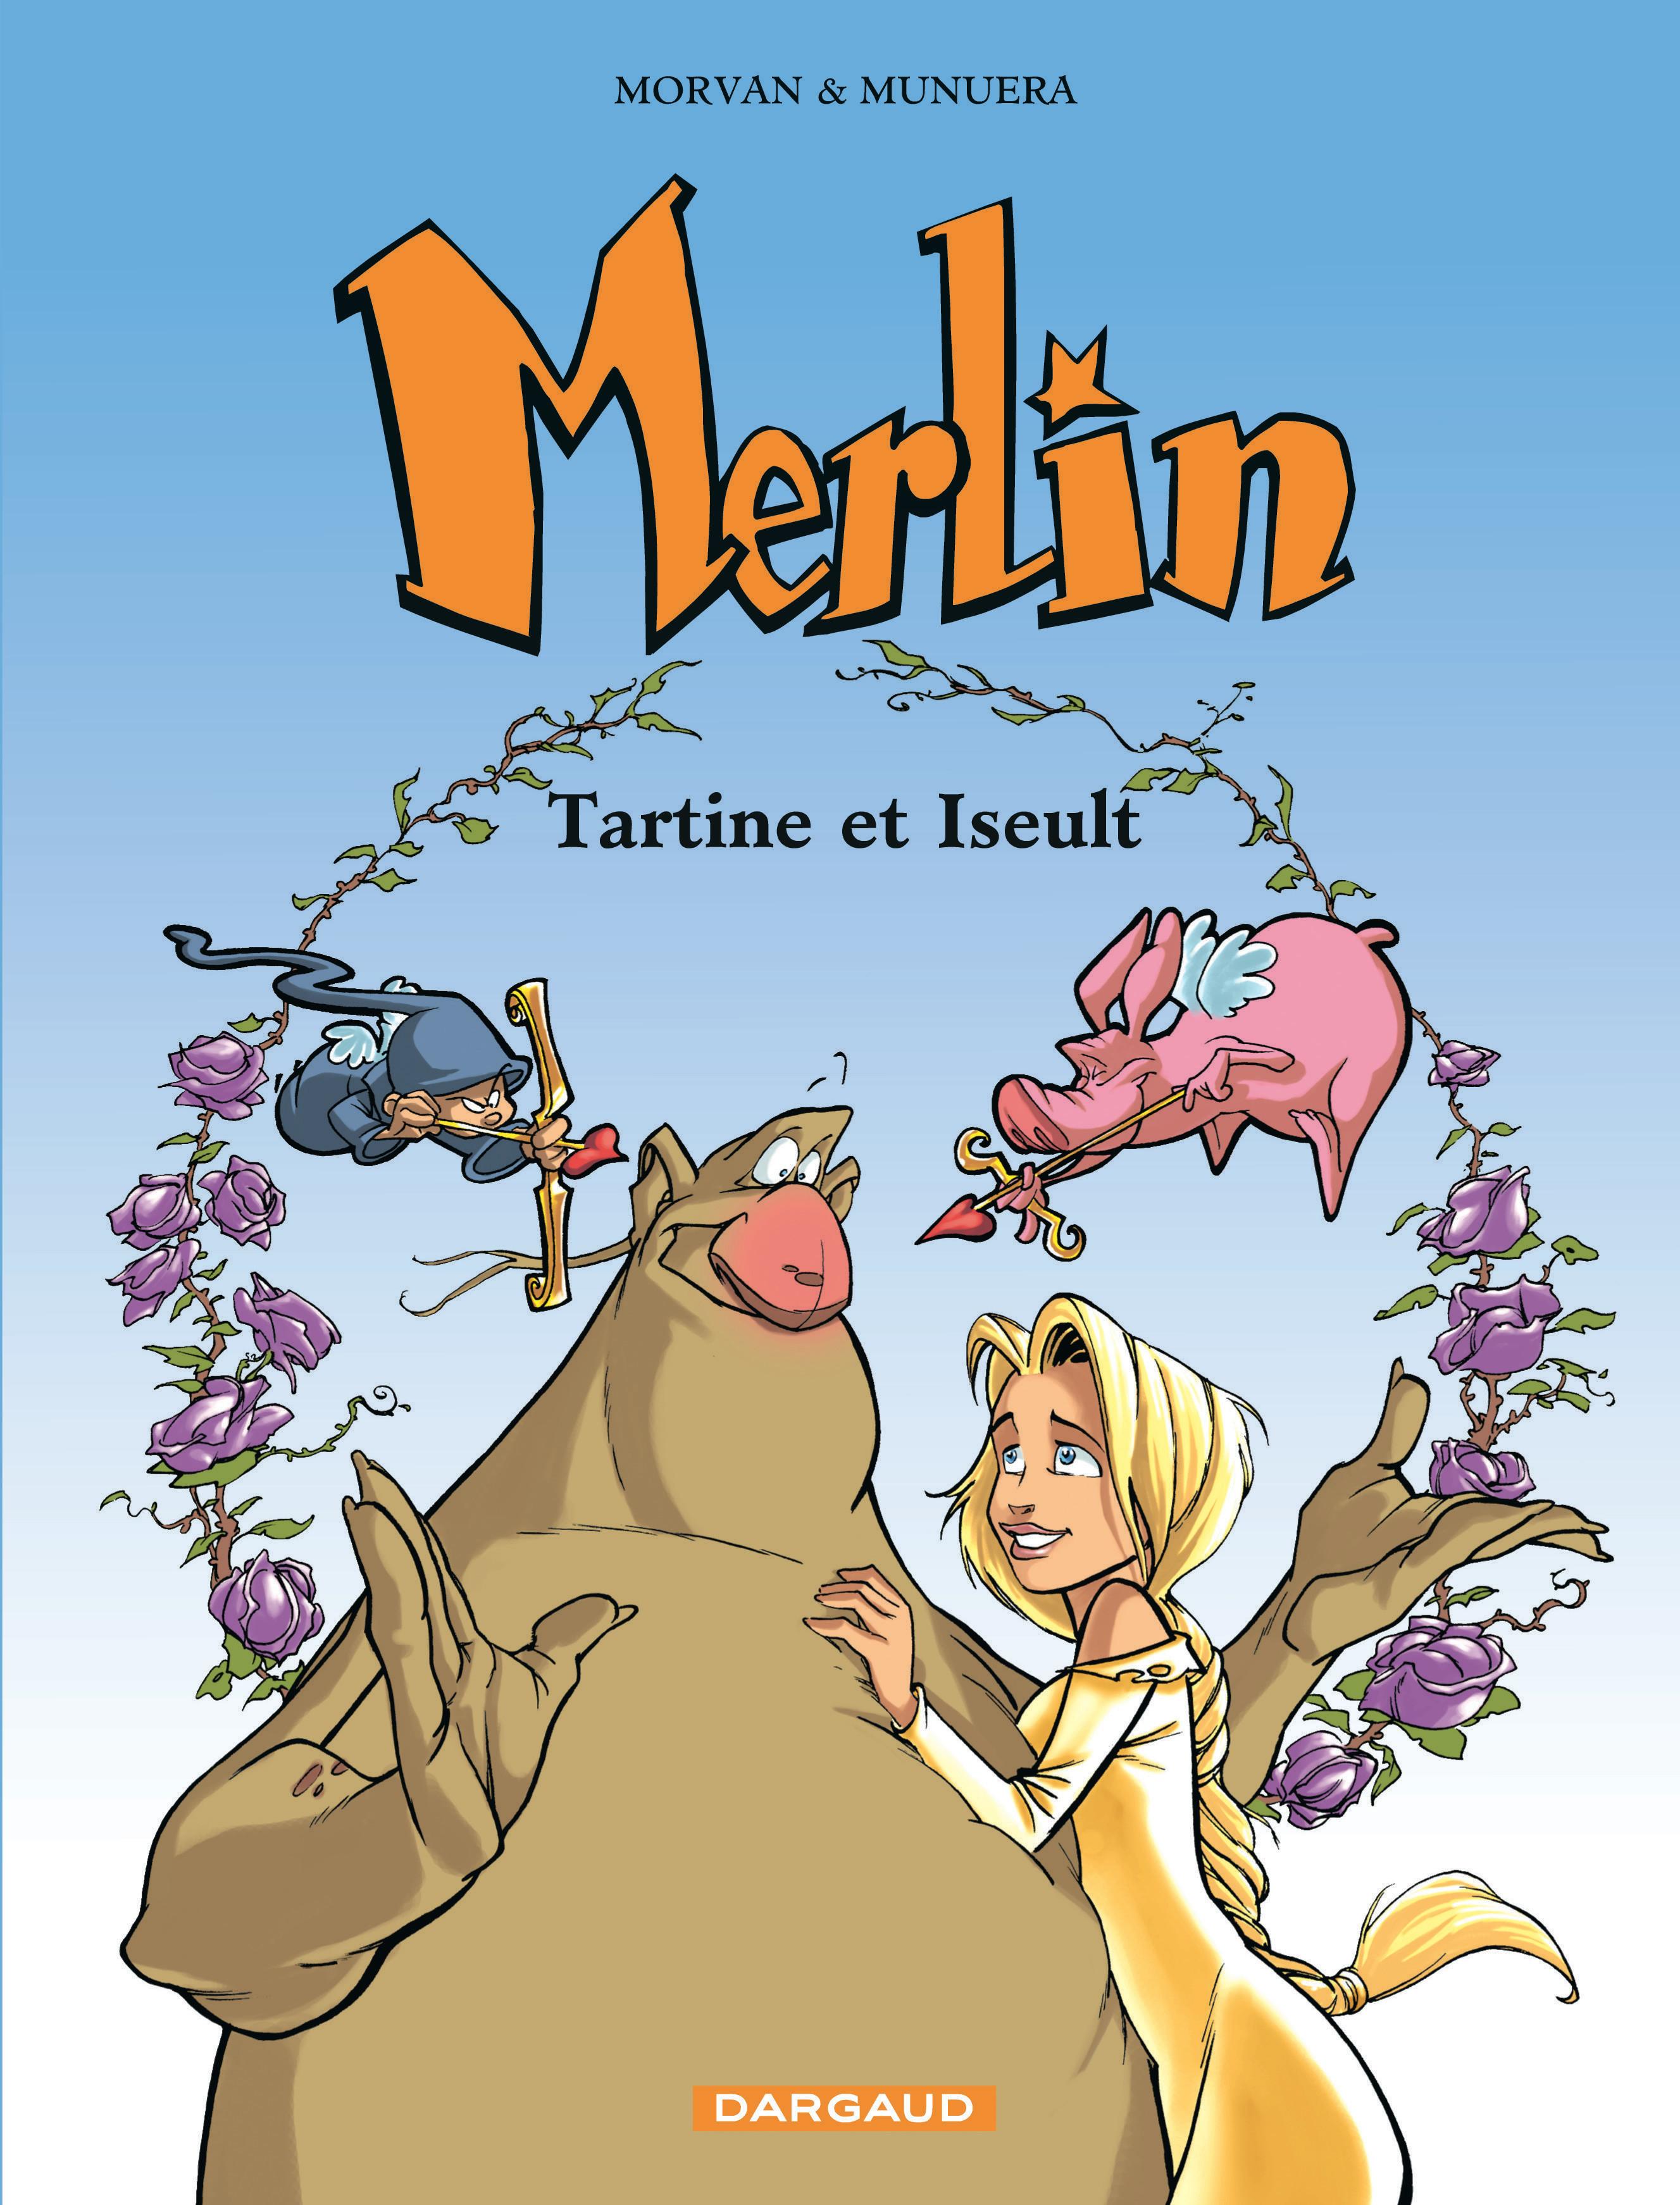 Merlin Tome 5 Tartine Et Iseult Bd éditions Dargaud